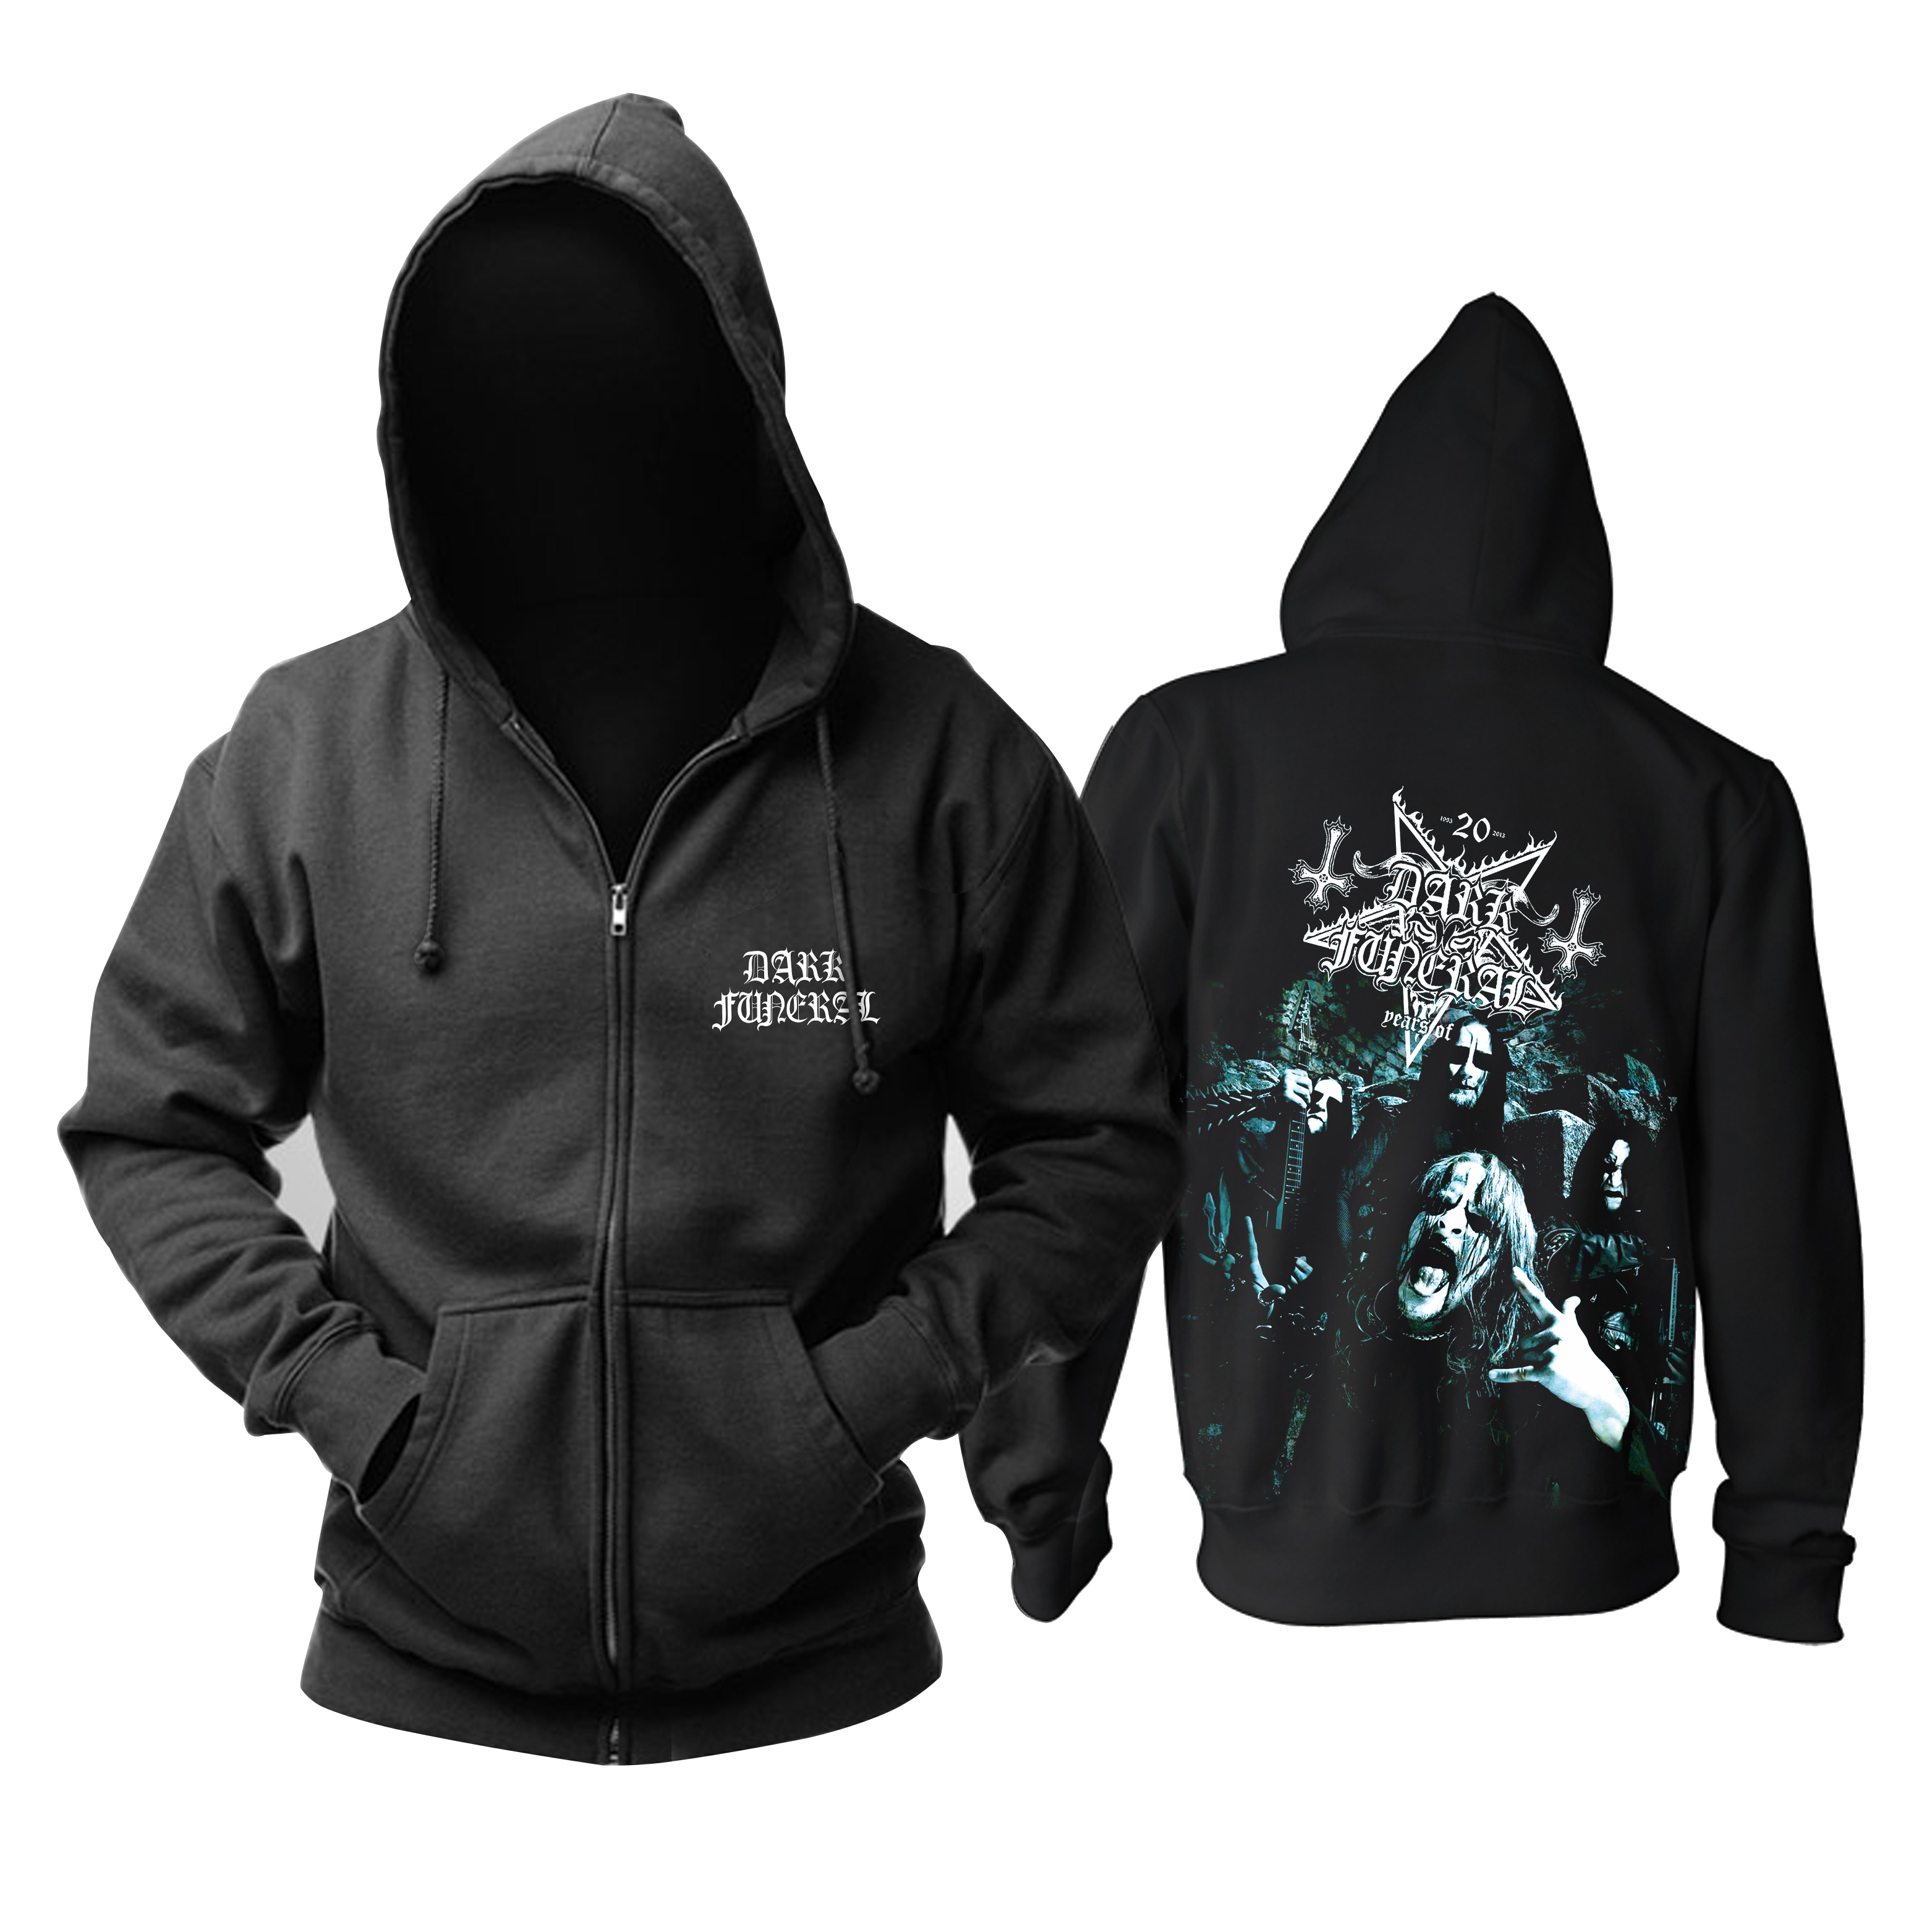 Collectibles Hoodie Dark Funeral Metal Band Black Pullover